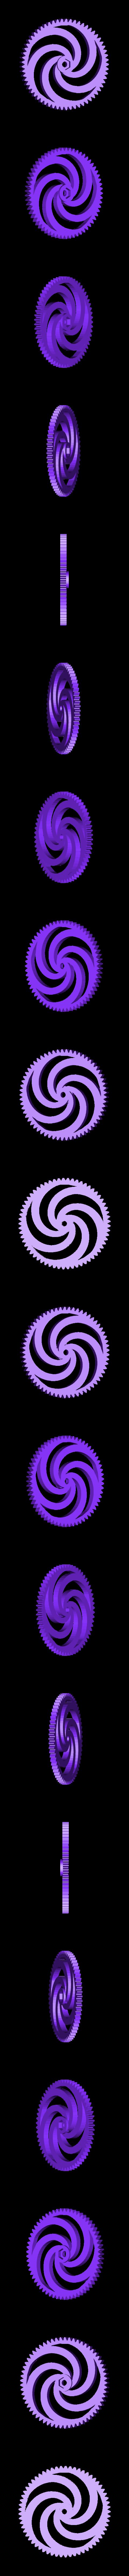 involute_blower_gear_drive.stl Download free STL file Involute Blower • 3D print design, Azagal